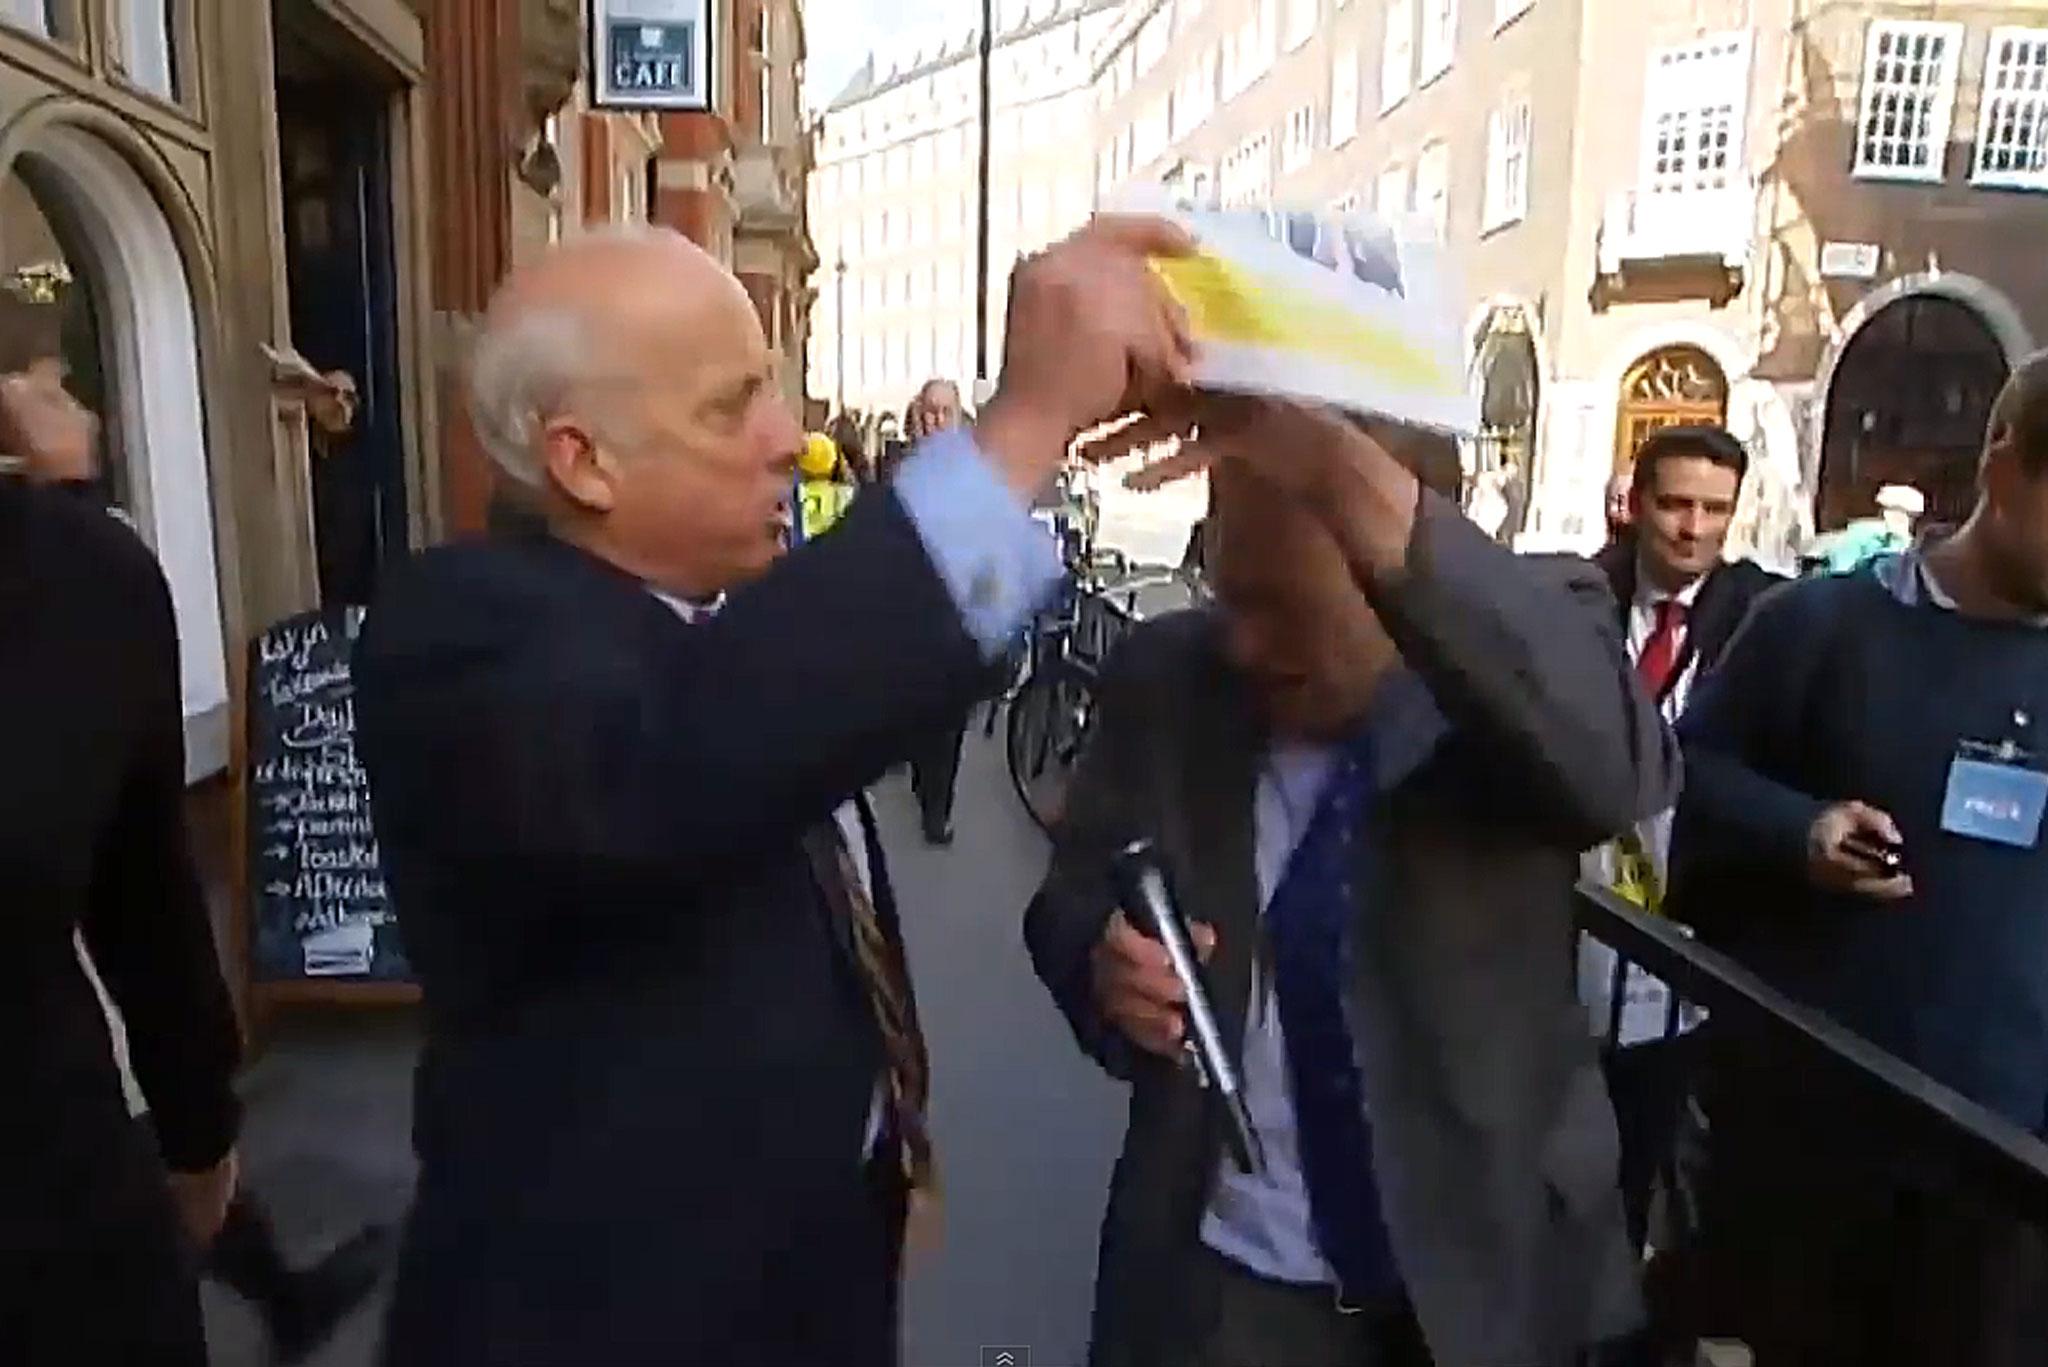 Godfrey Bloom hits Michael Crick over the head with a UKIP brochure.